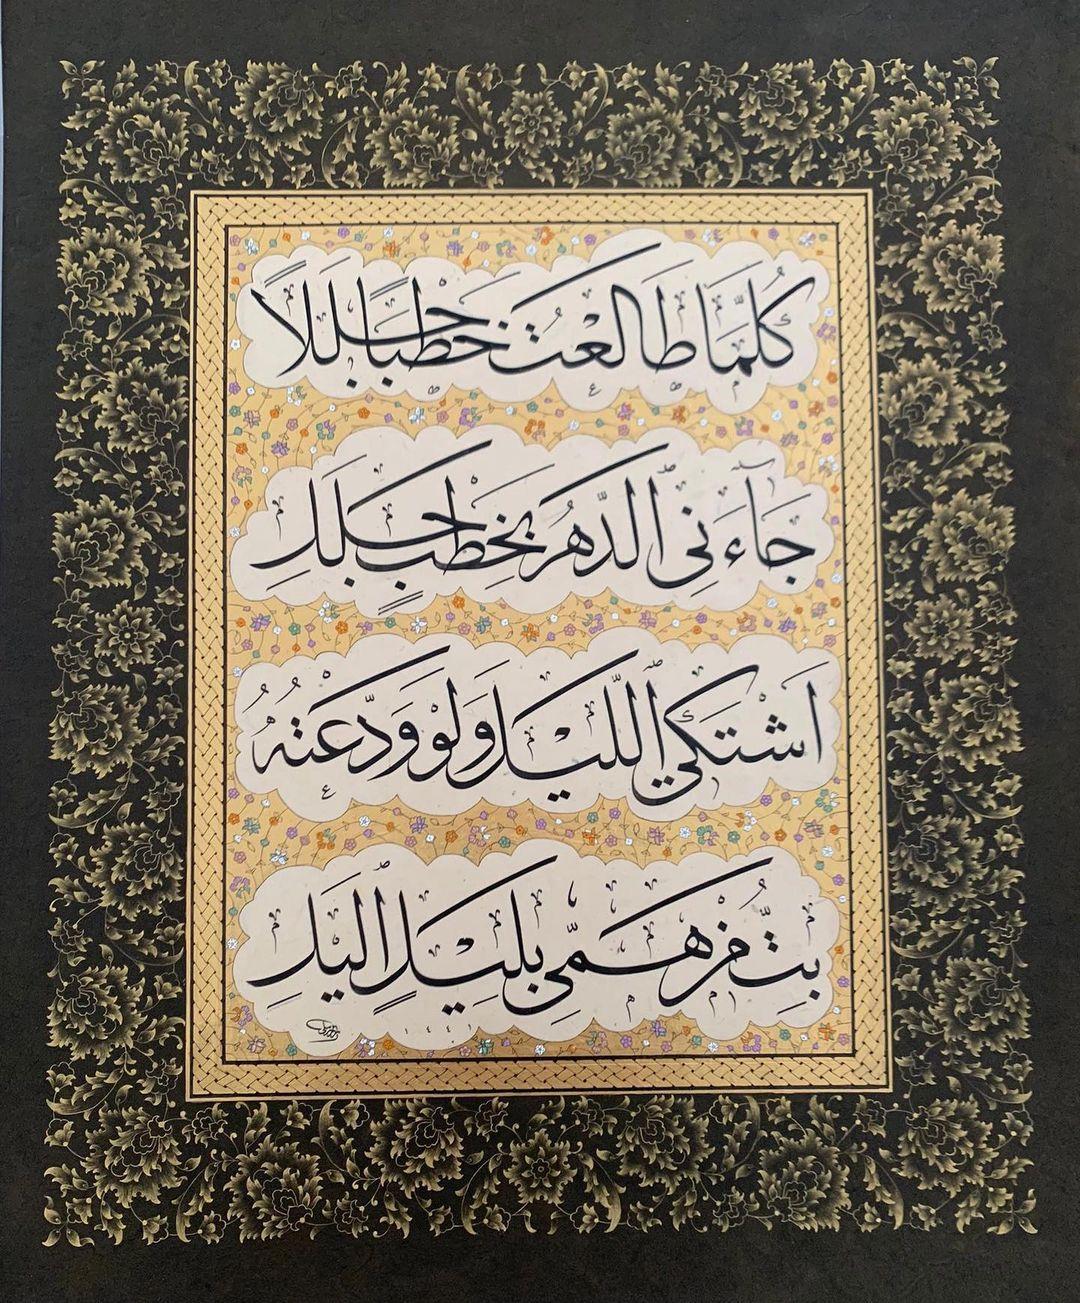 Professional Calligrapher Bijar Arbilly Calligraphy  ايليا ابو ماضي الادب العربي ،من تذهيب السيده بوسه #calligraphy #kunst #art #tehr… 340